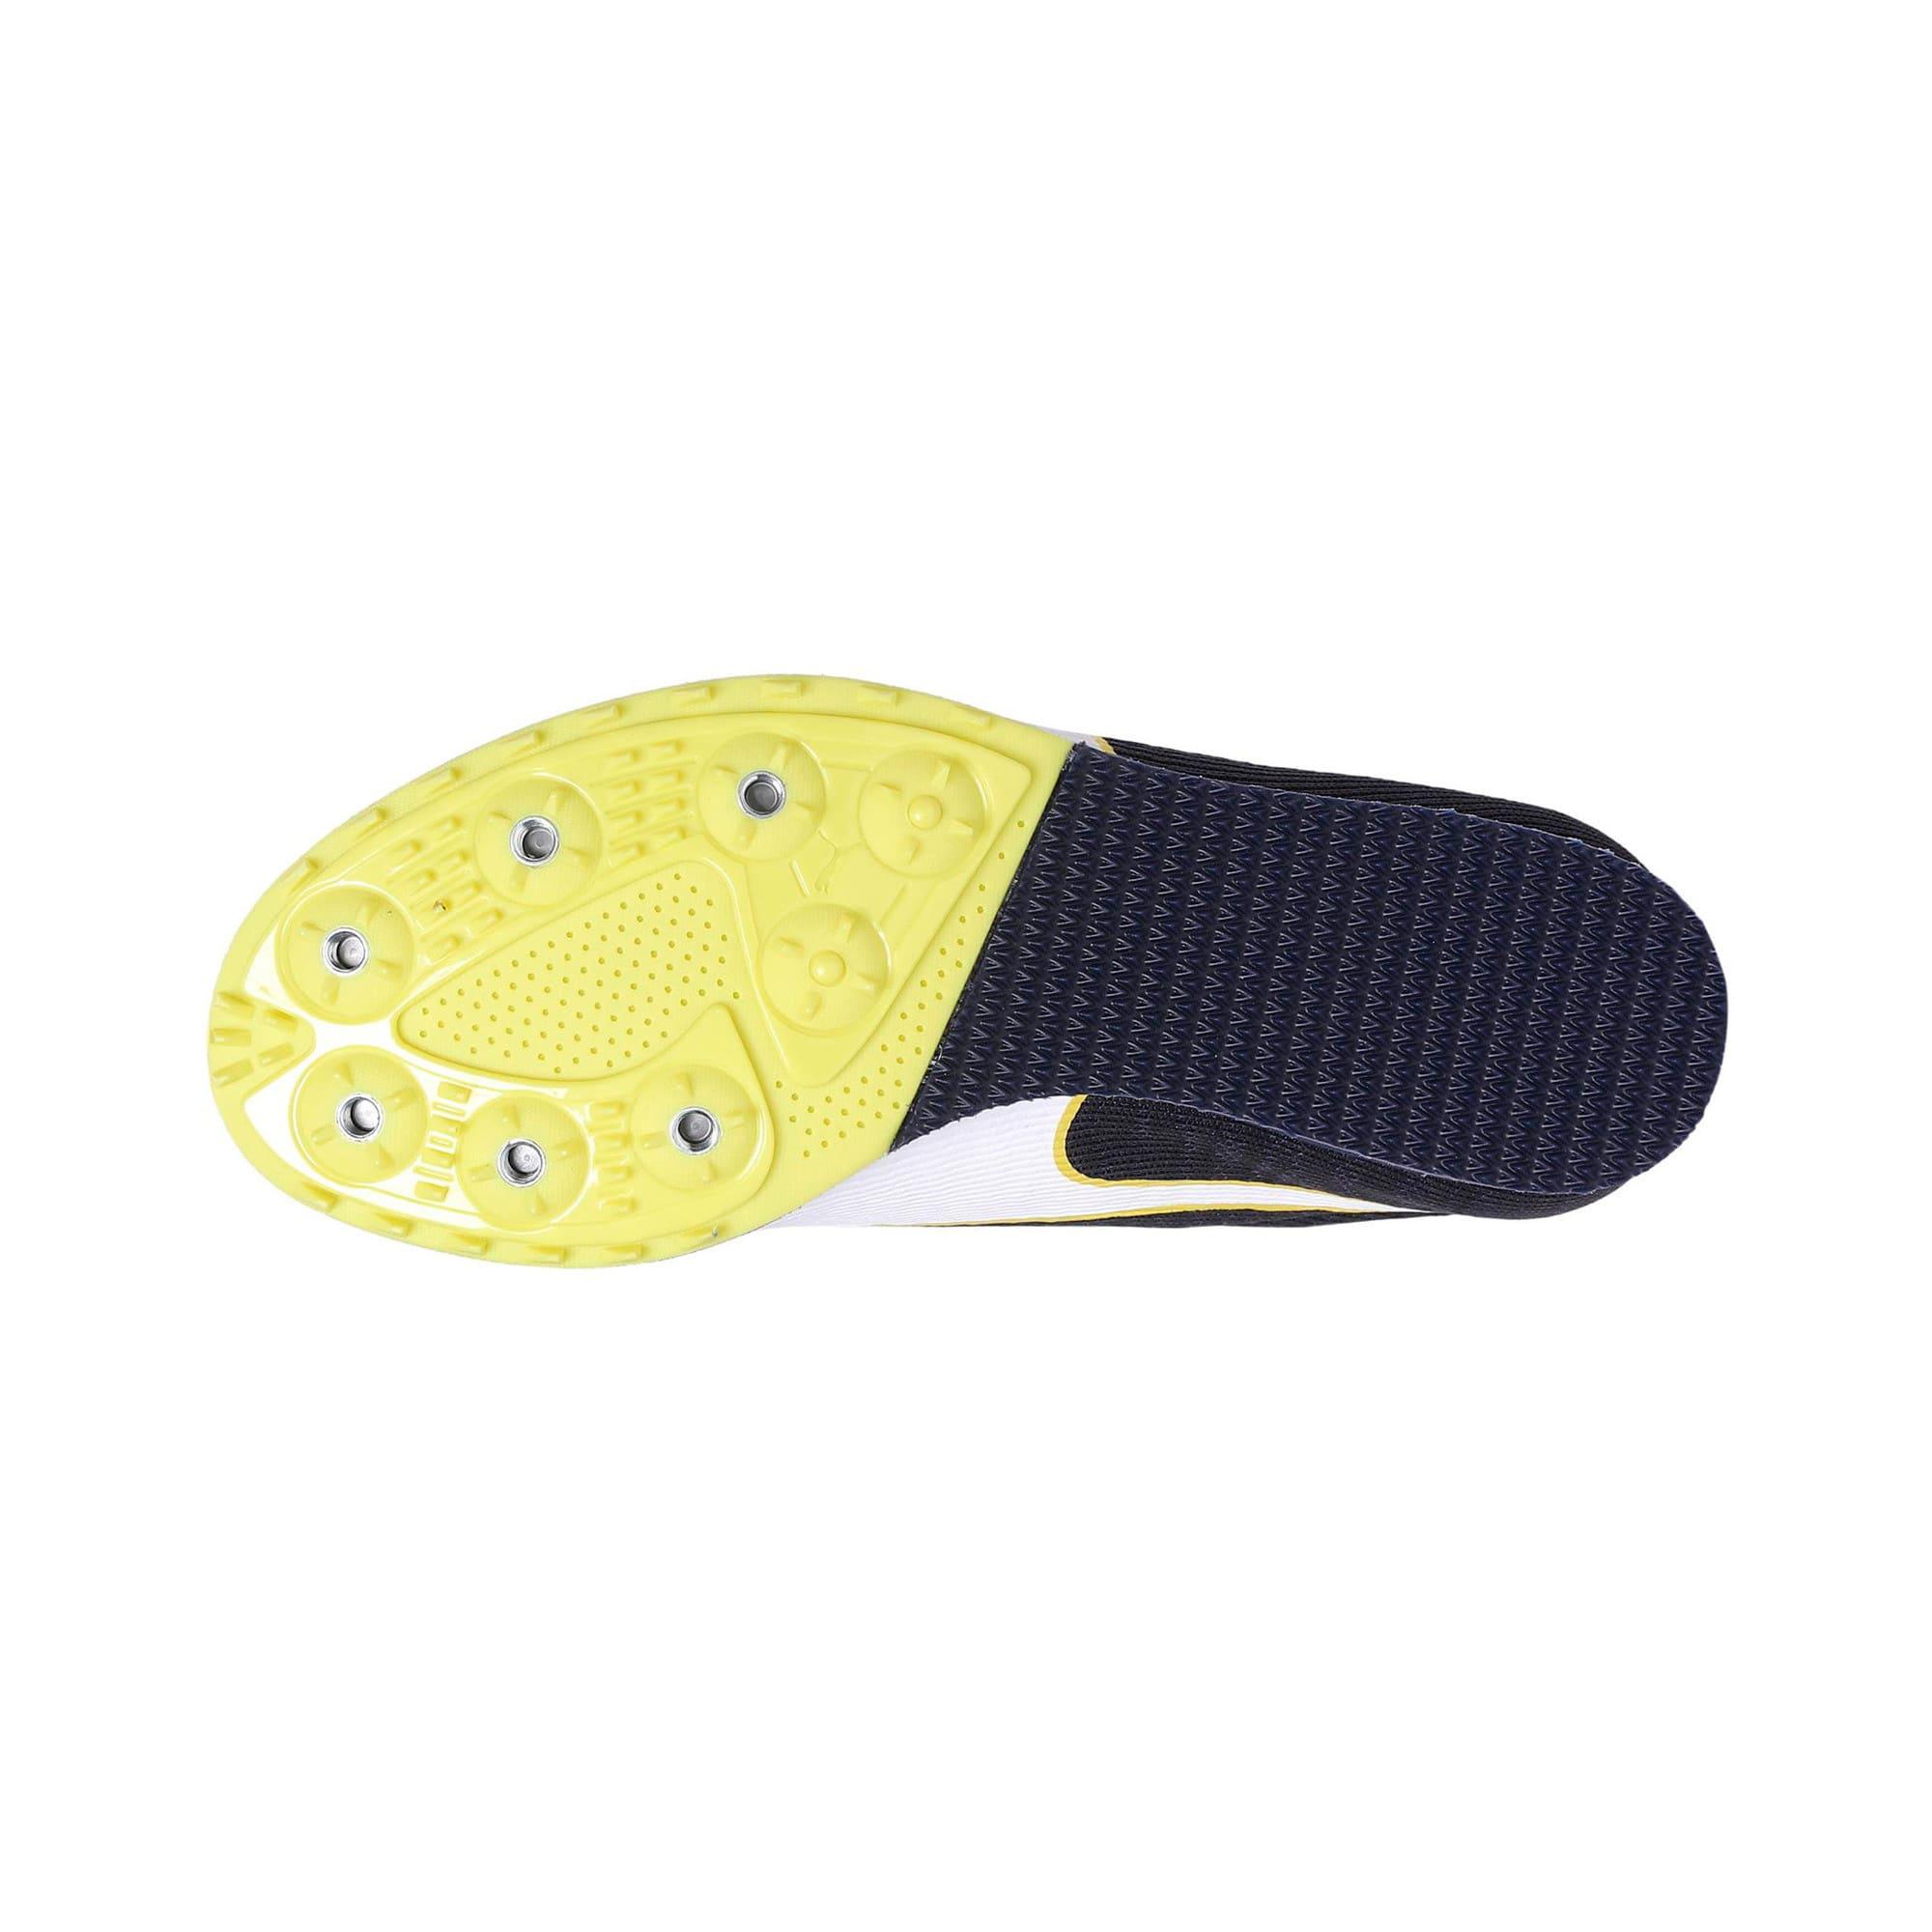 Thumbnail 4 of evoSPEED Star 6 Kids' Running Shoes, Peacoat-Puma Black-Yellow, medium-IND